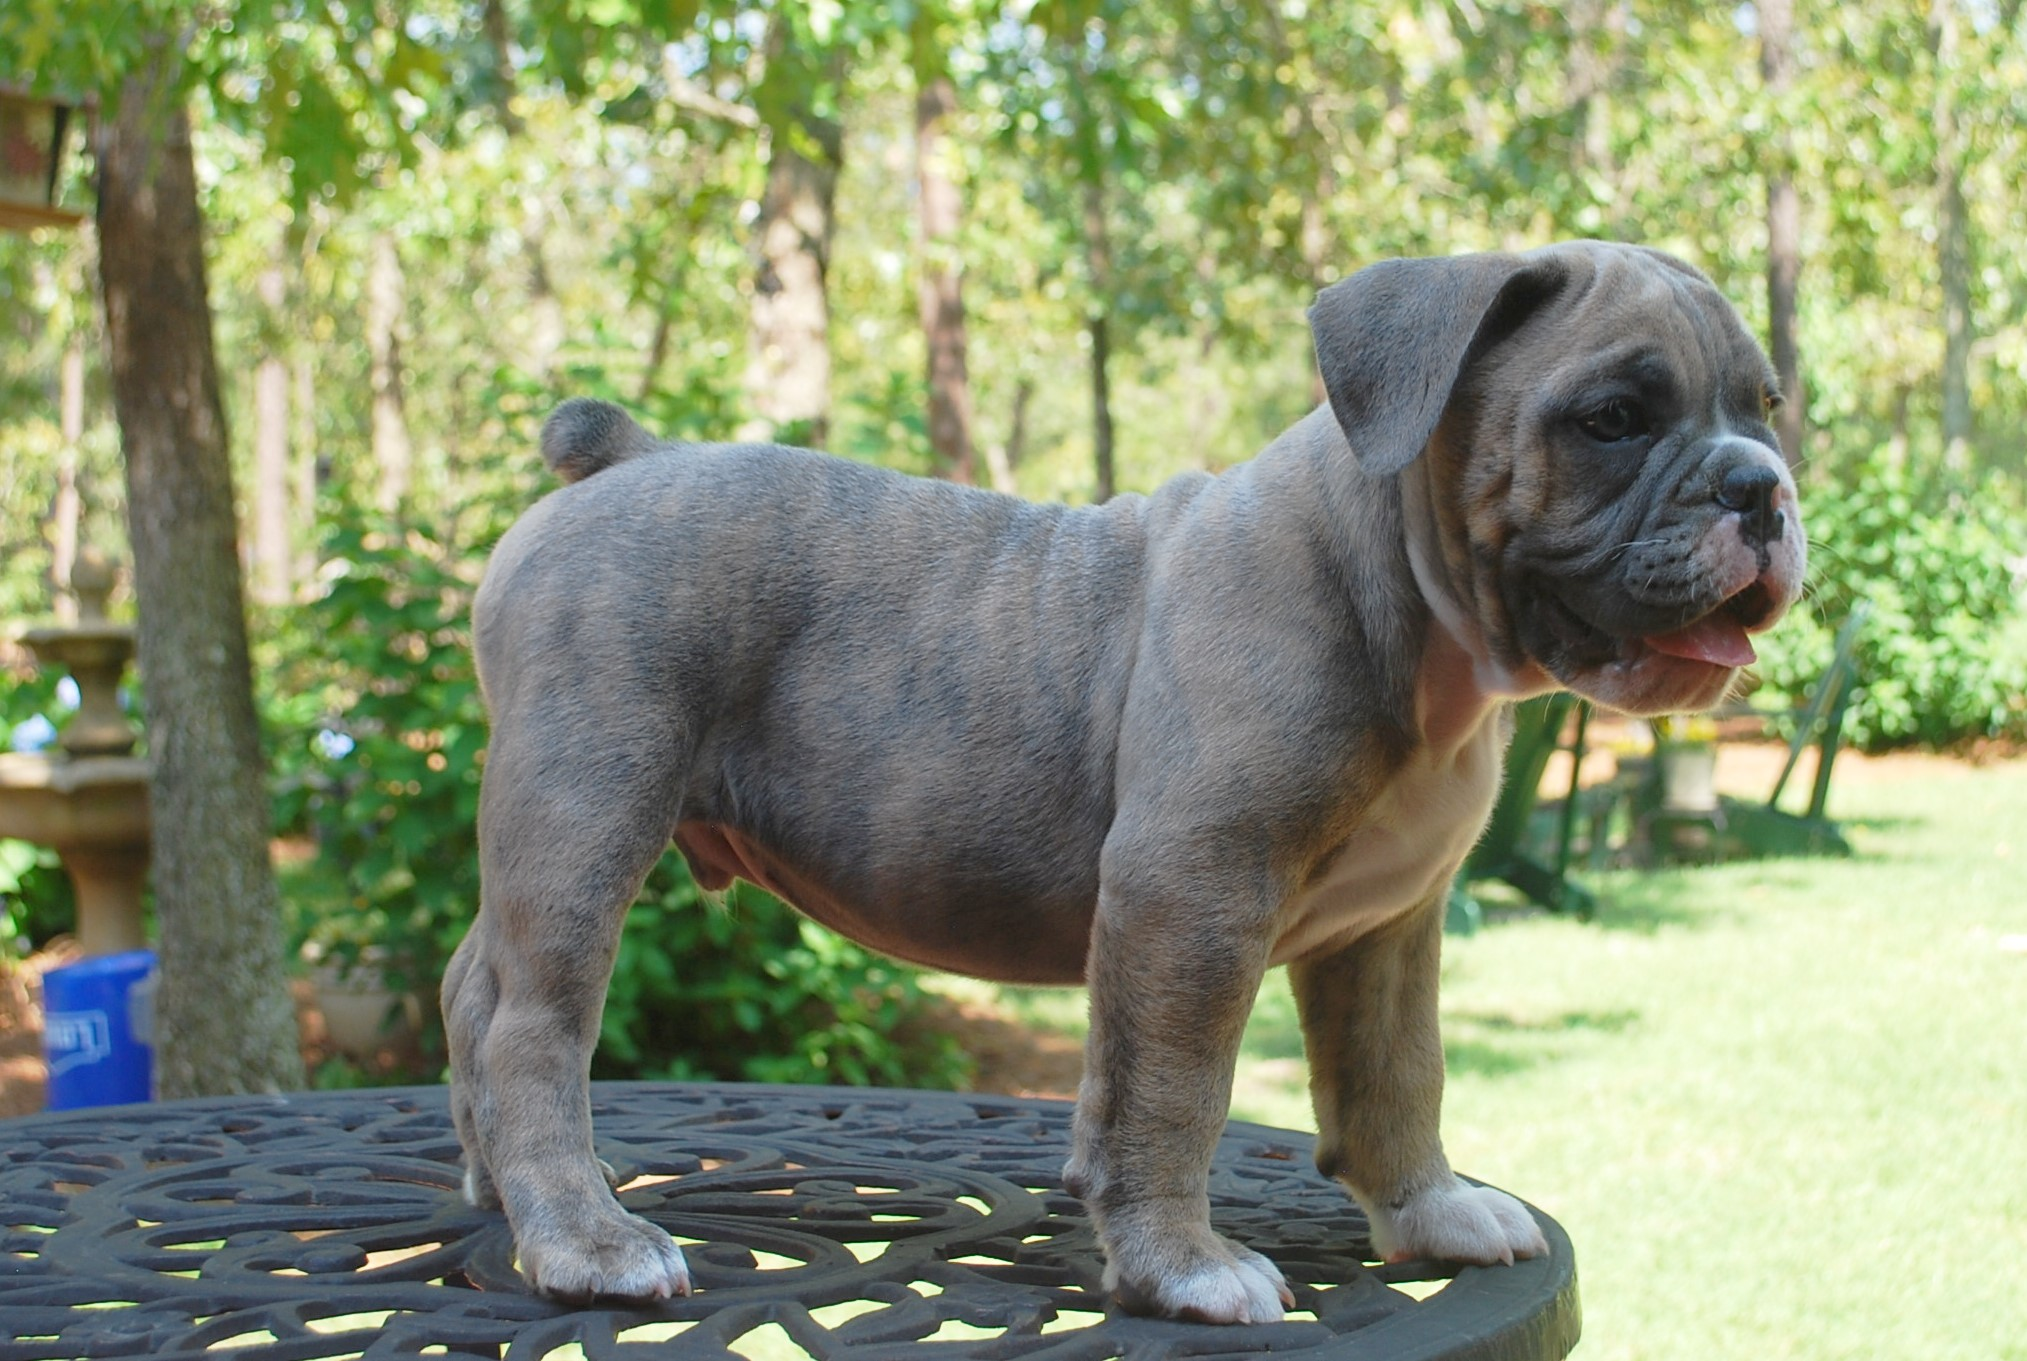 Hawkeye Olde English Bulldogge Puppy For Sale | Photo 3